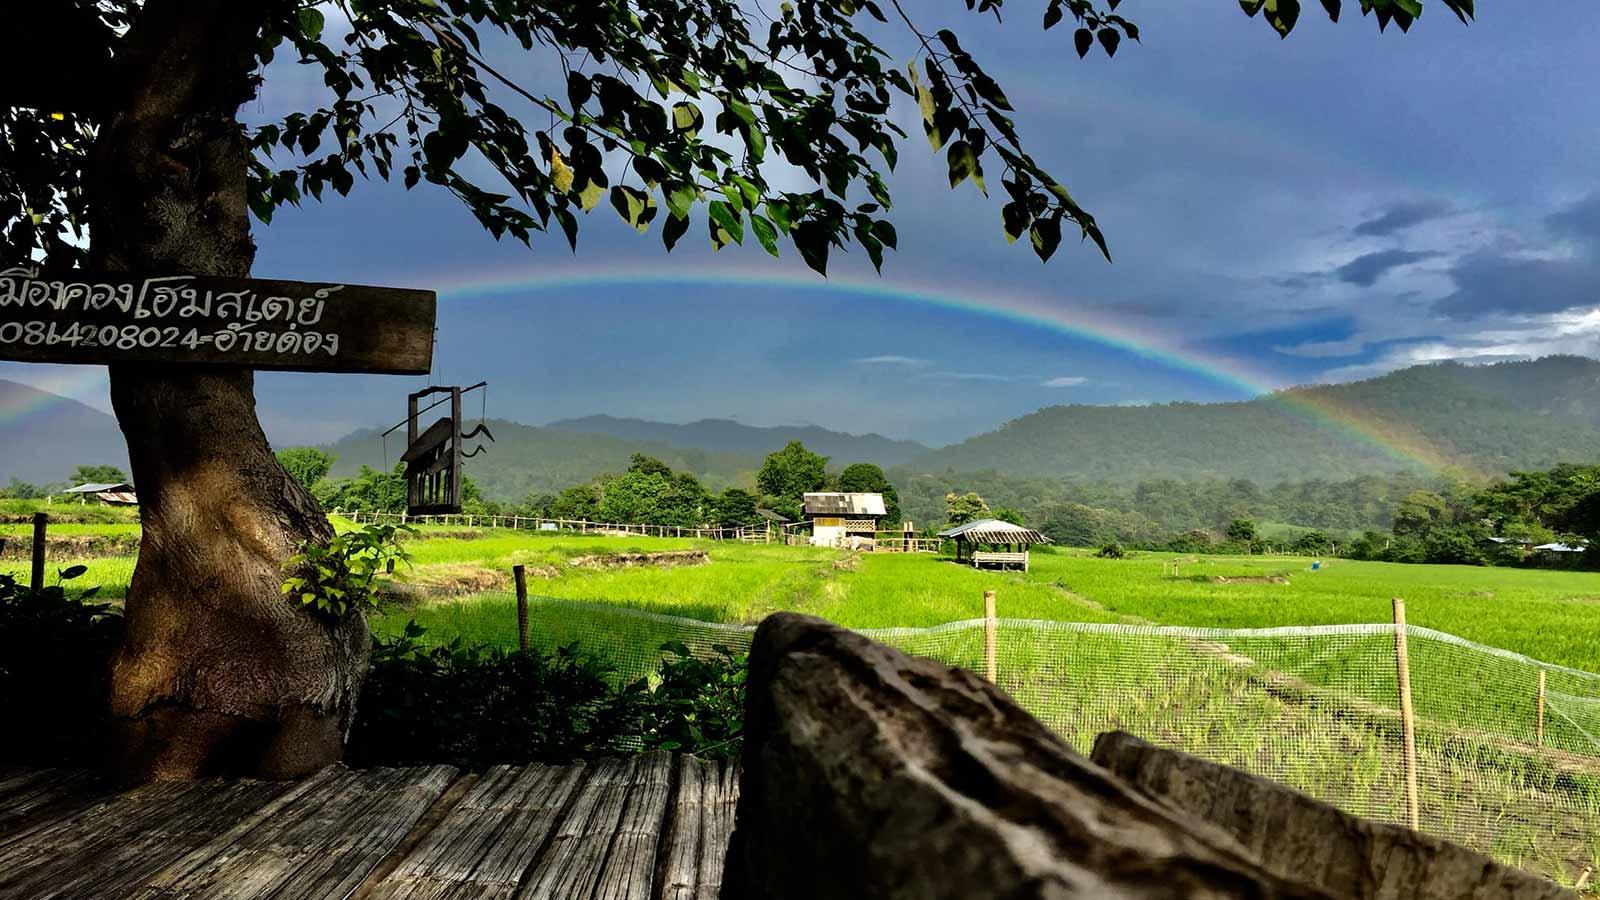 Chiang mai Muangkong rice field